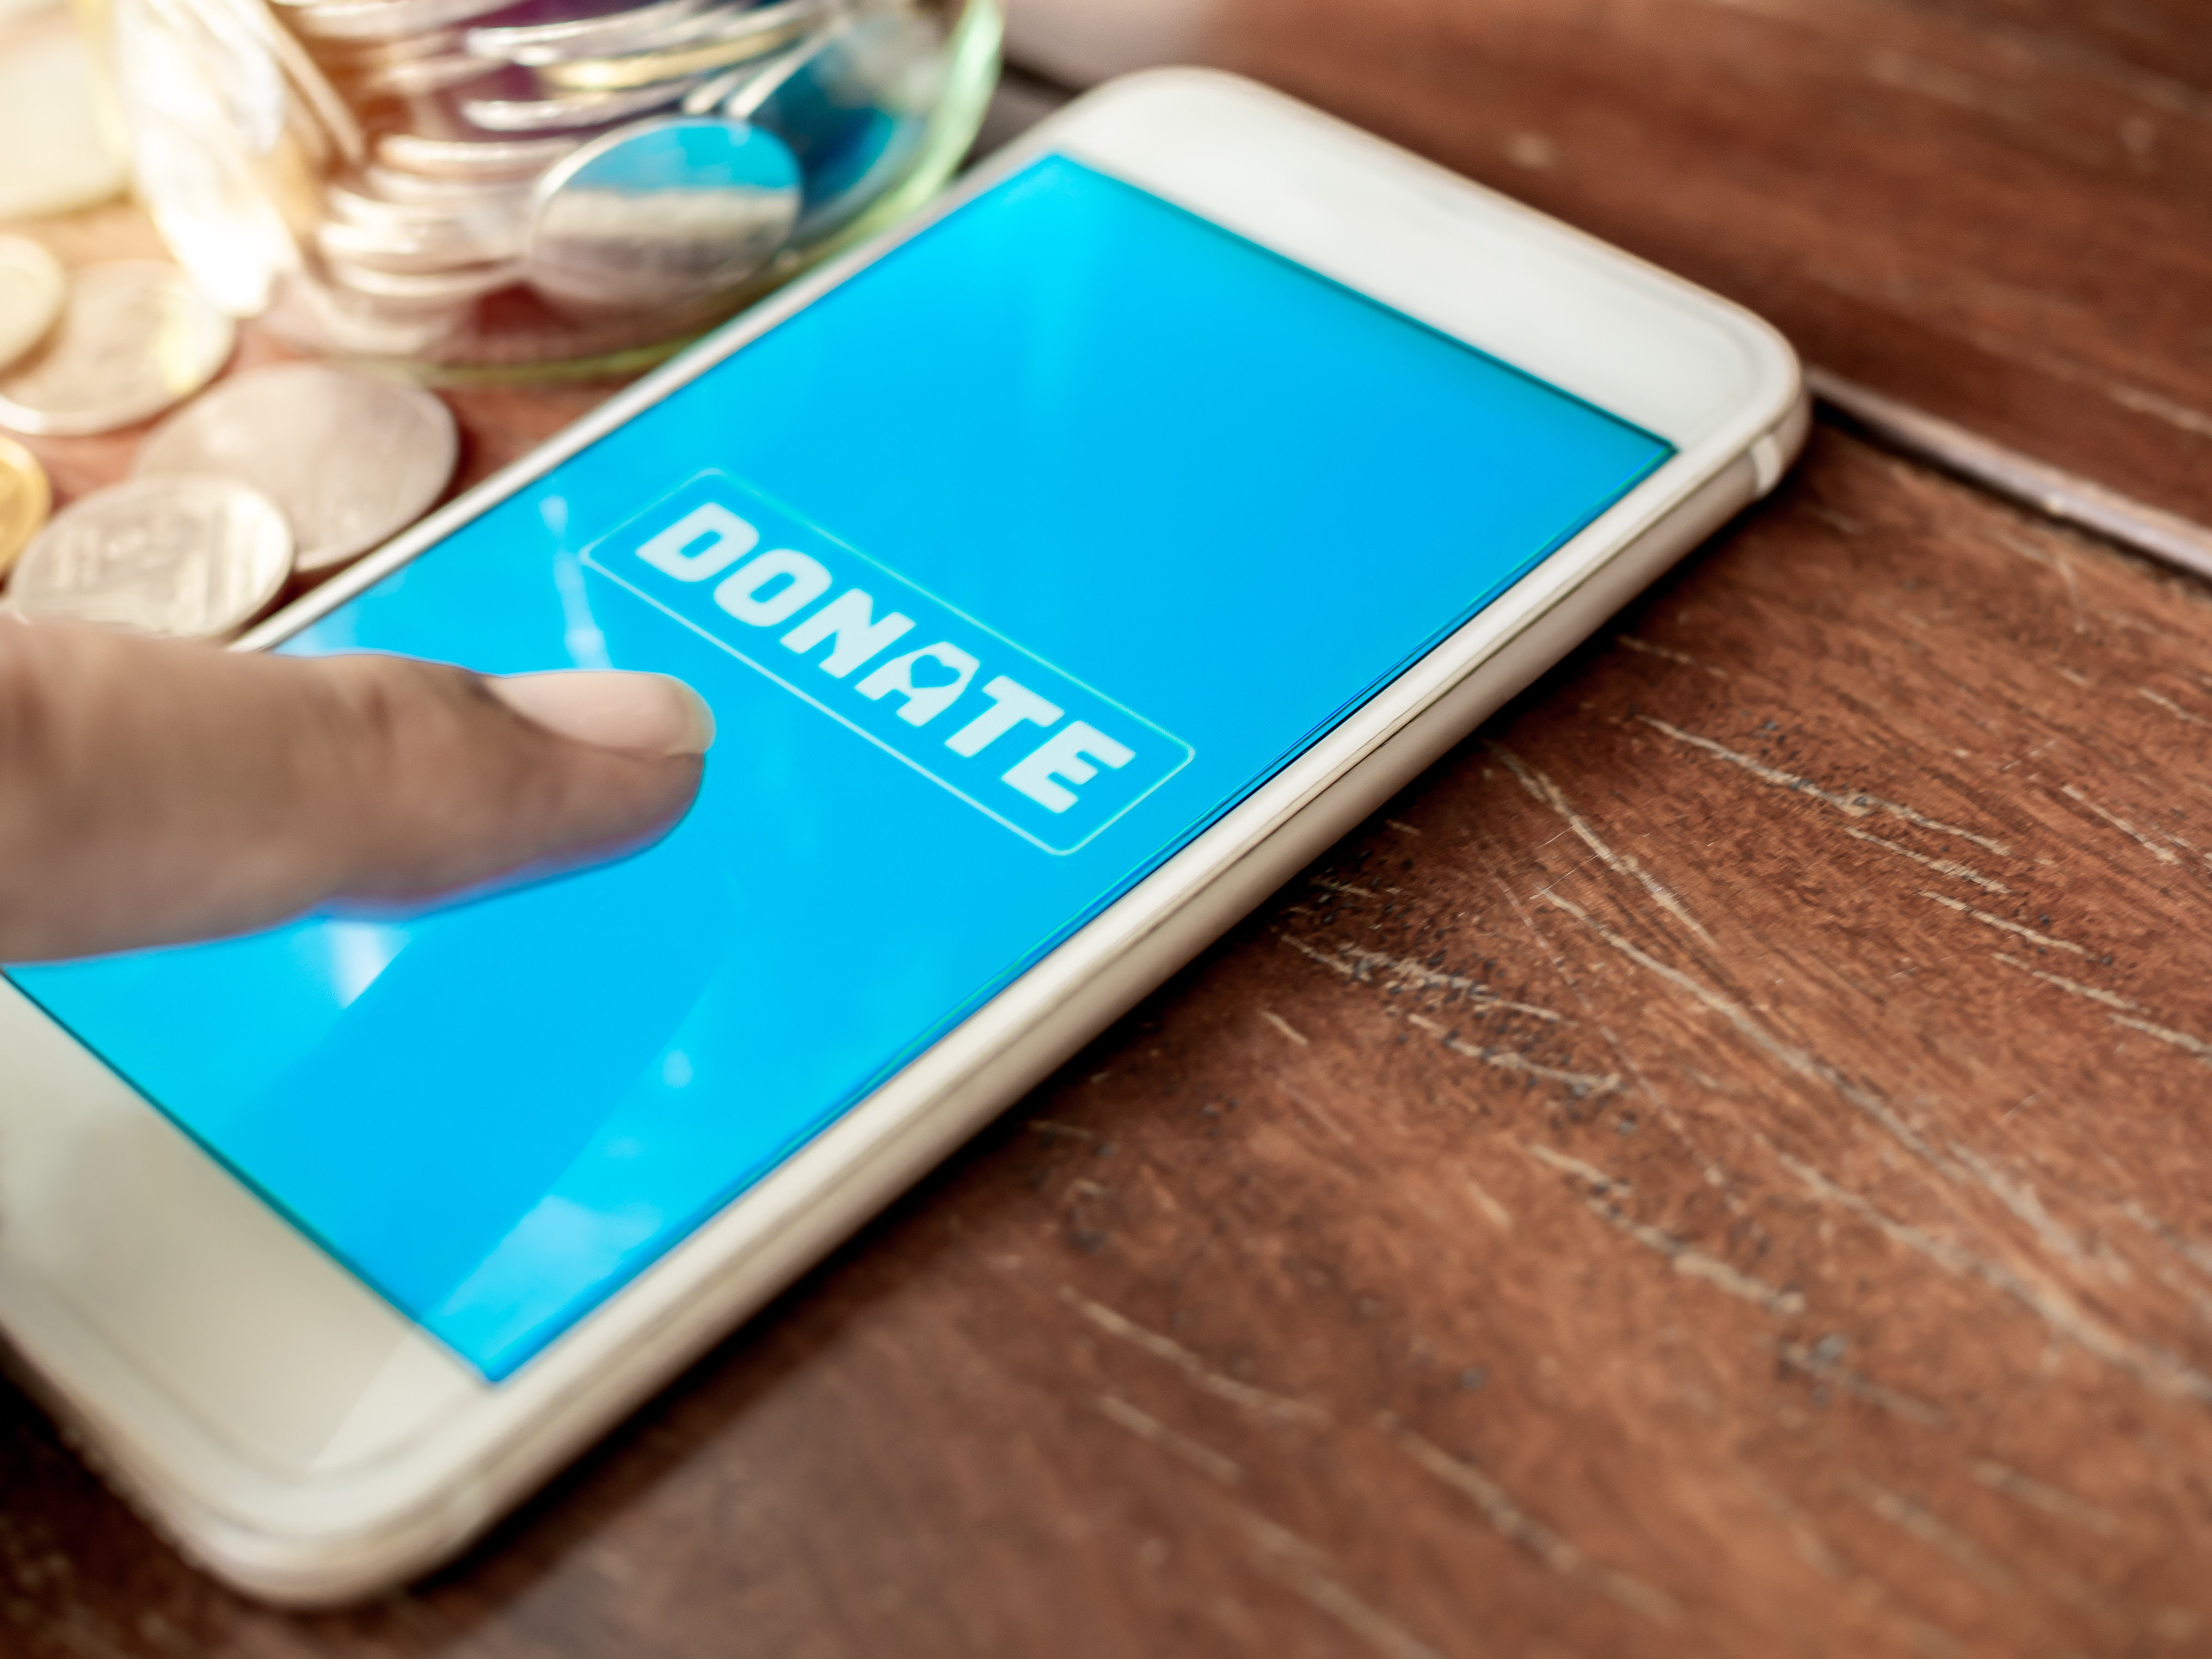 Donate image mobile phone